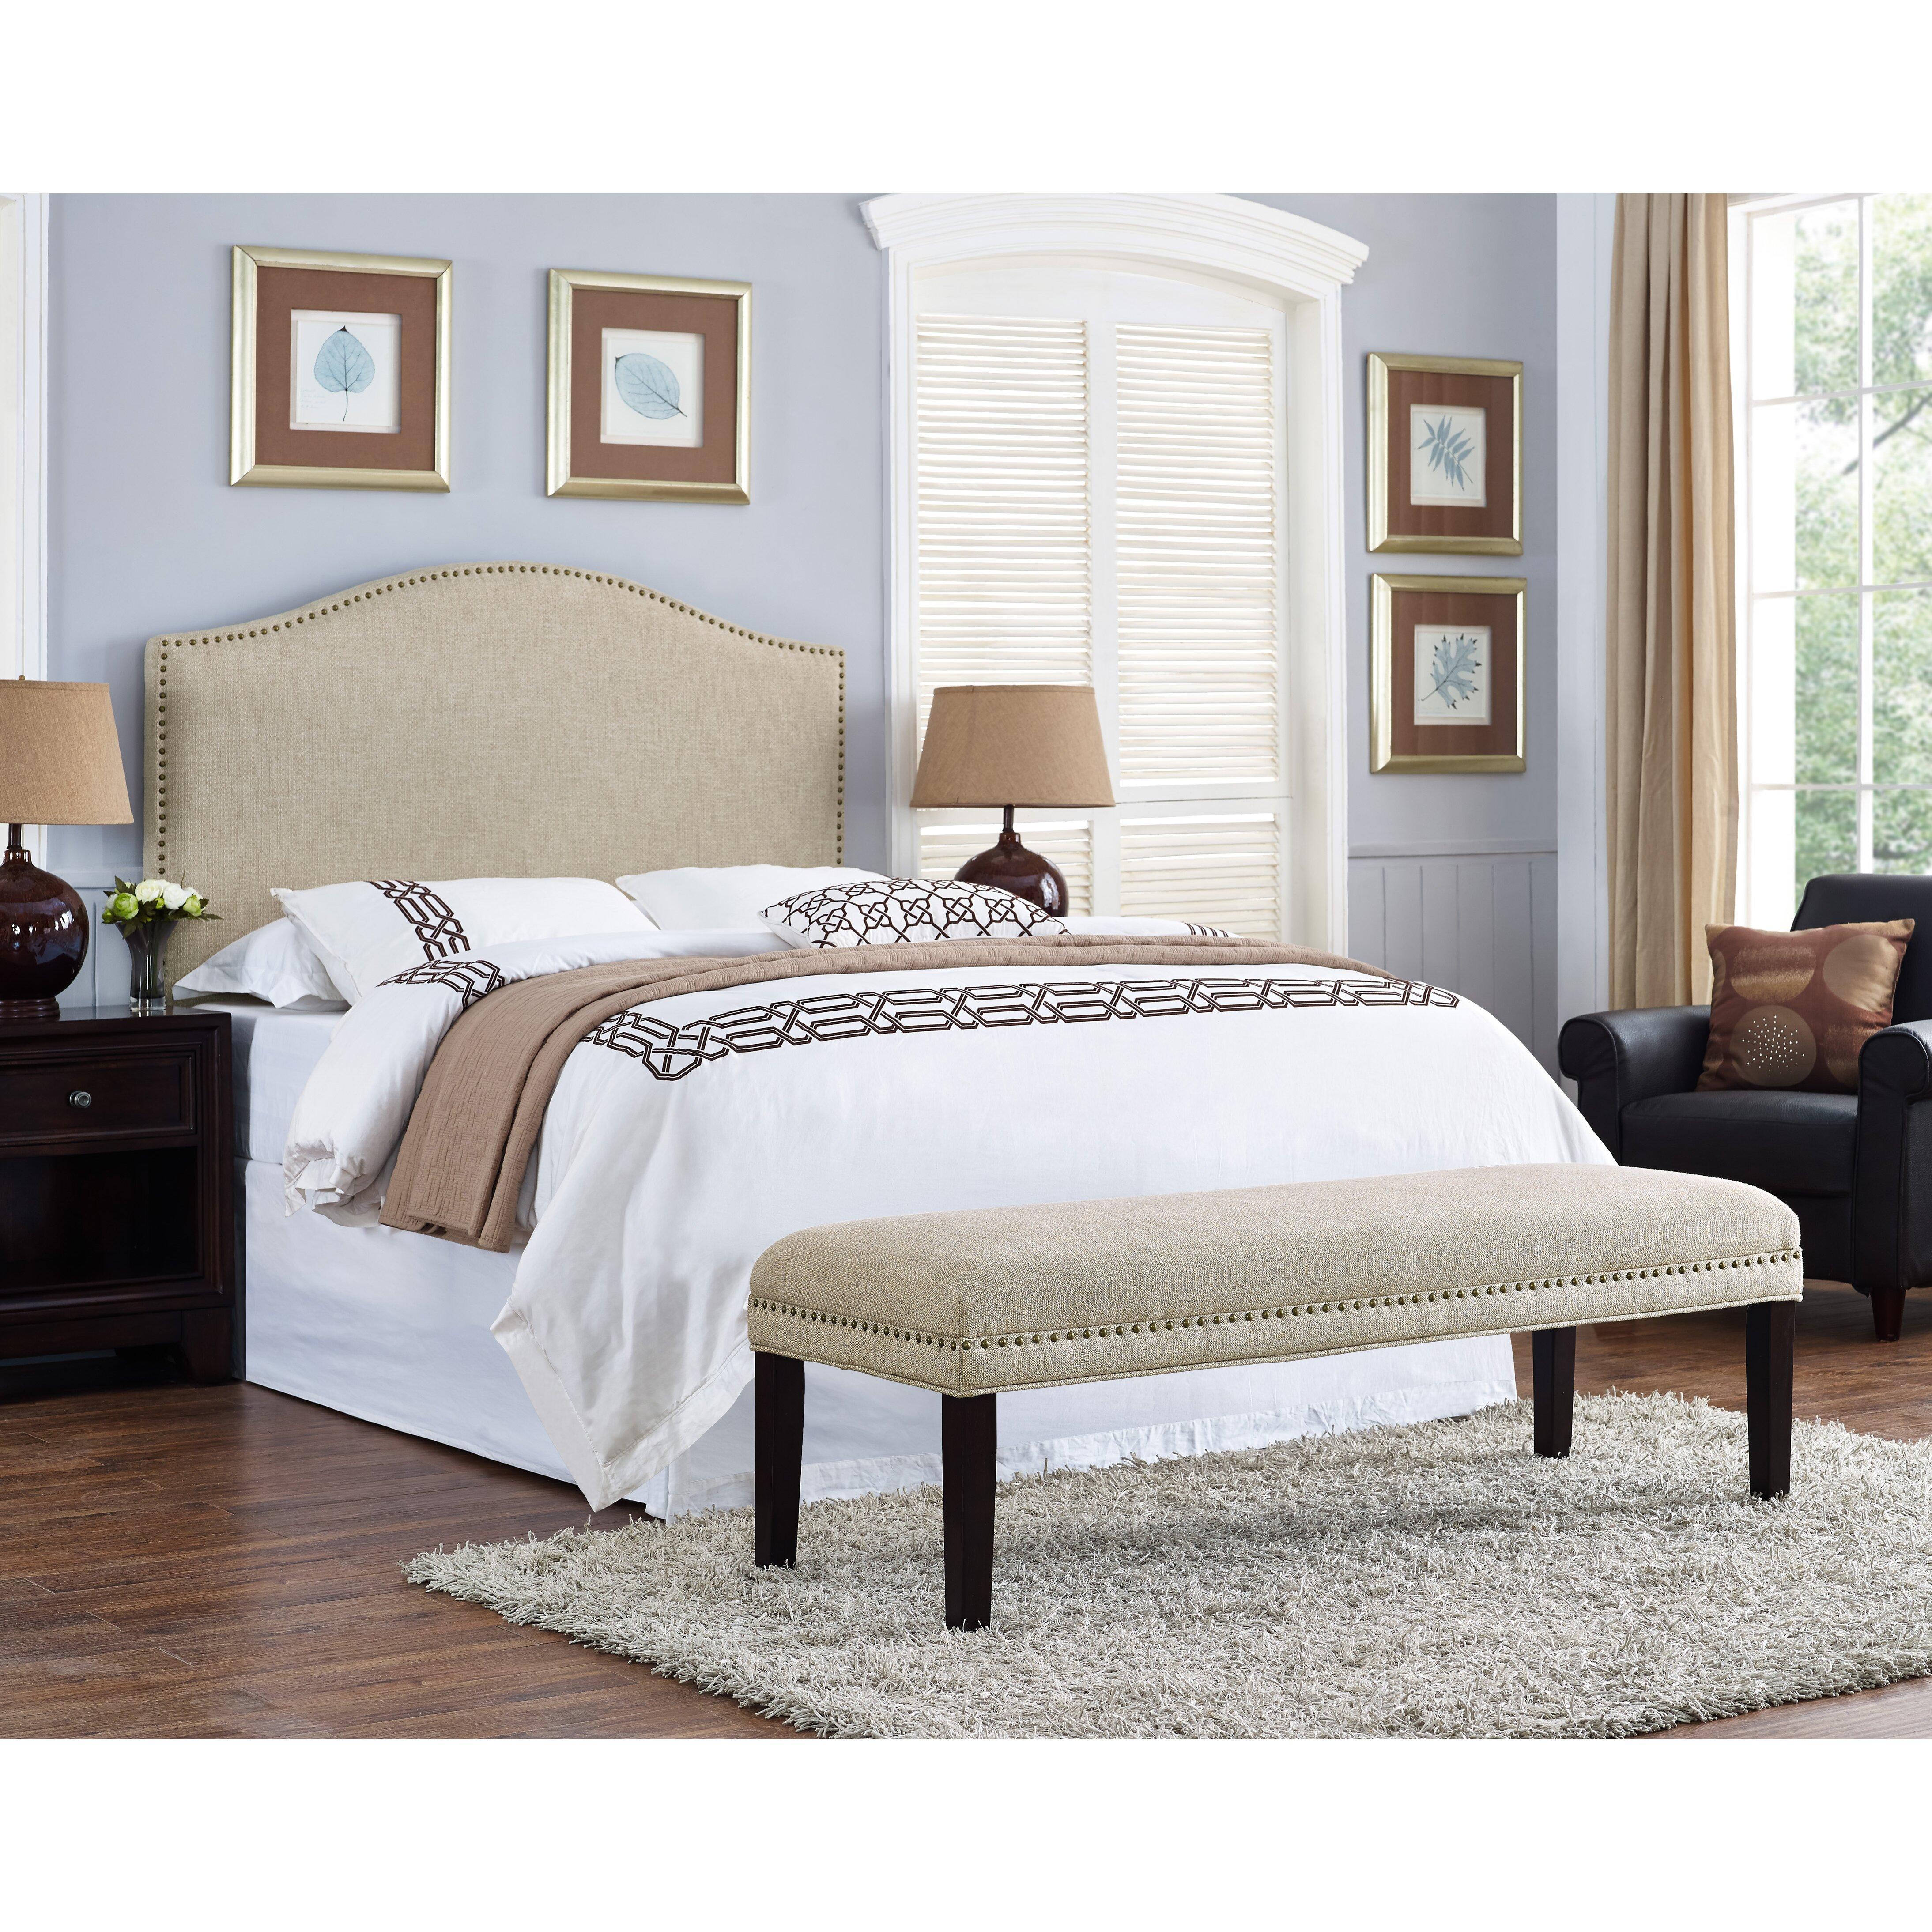 PRI Upholstered Bedroom Bench & Reviews